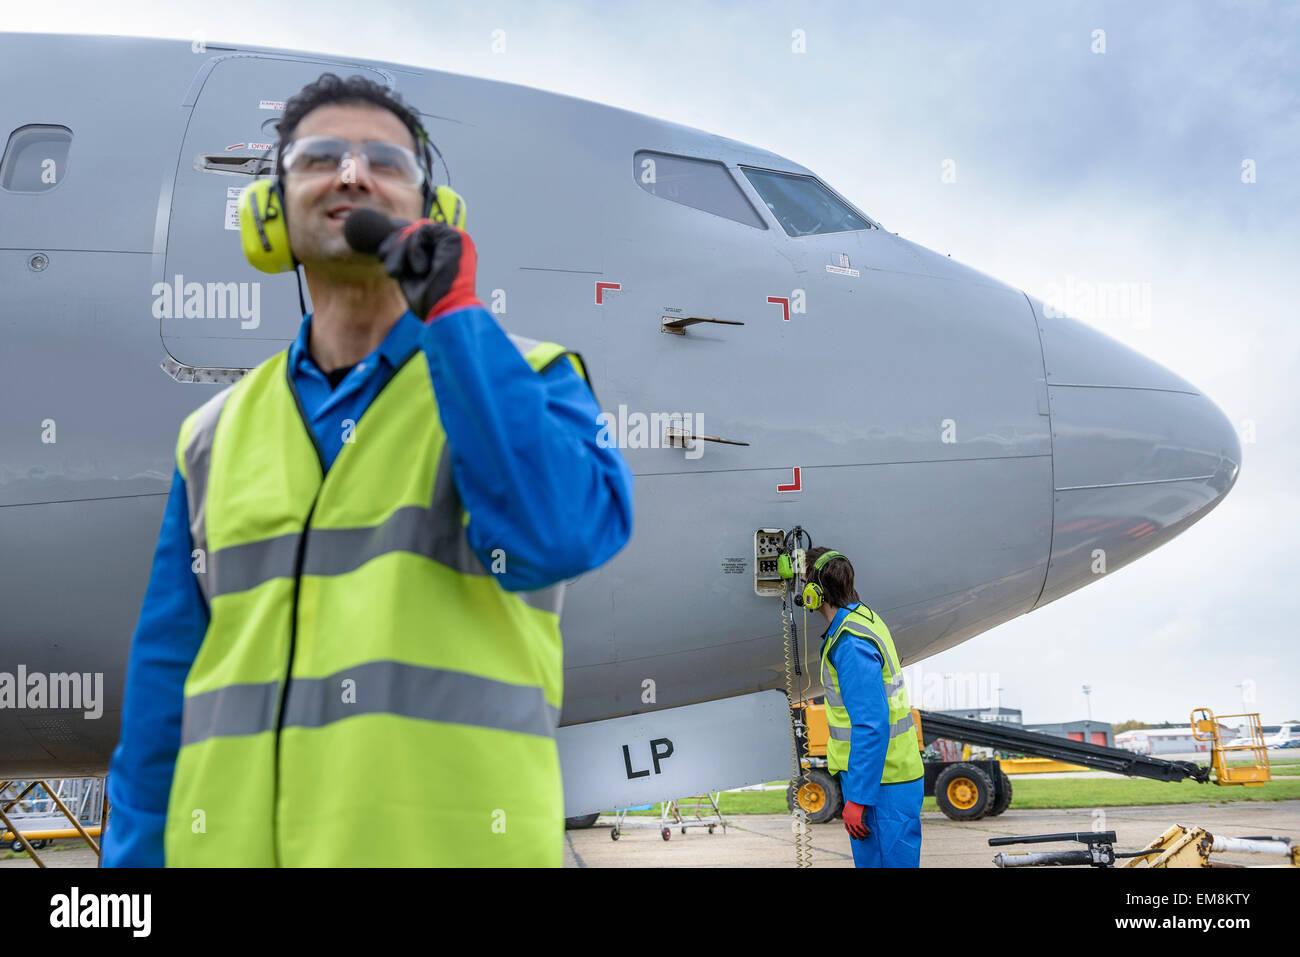 Airside engineer talking on radio near aircraft on runway - Stock Image